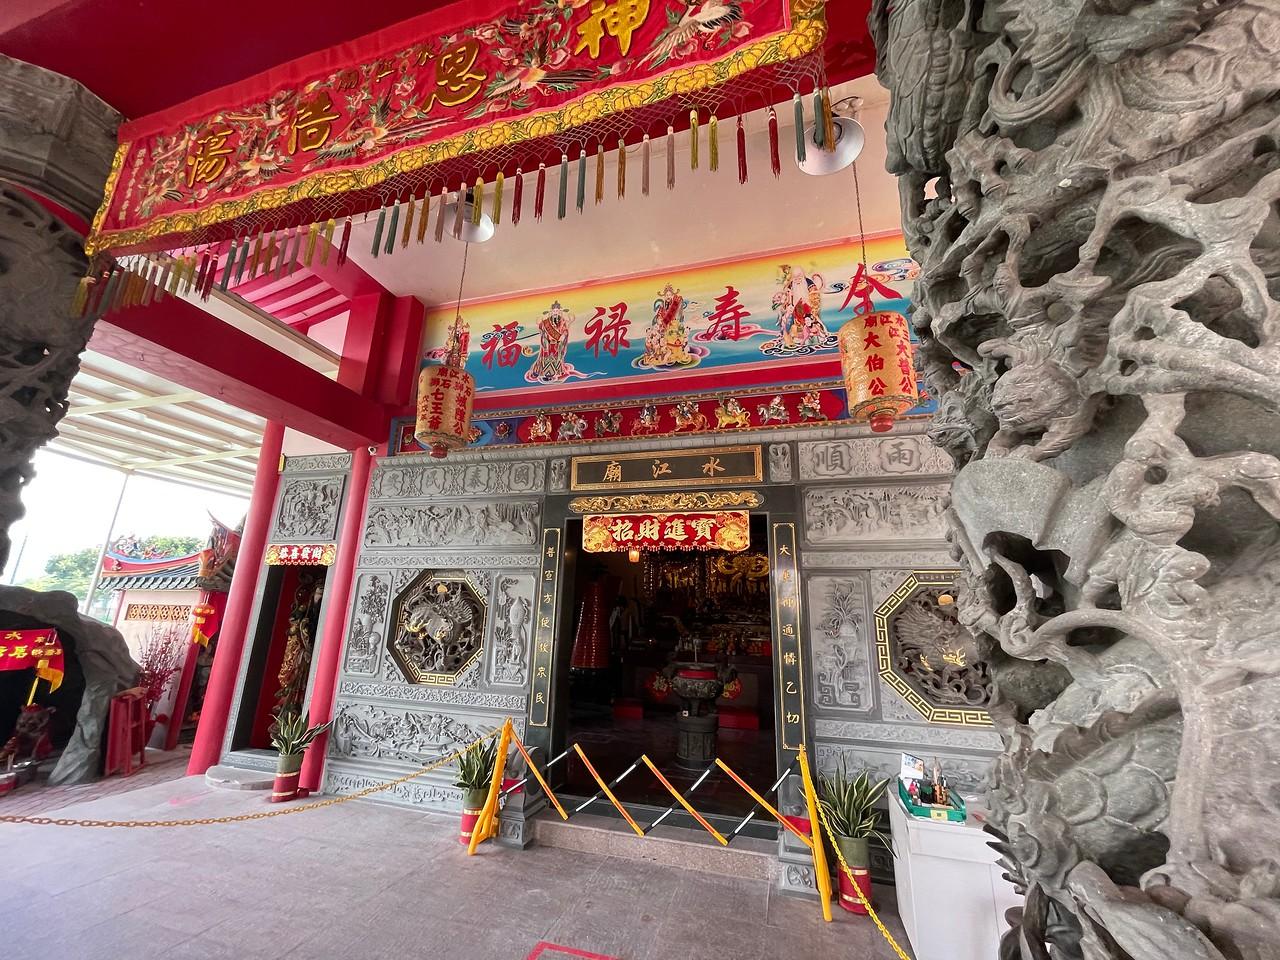 Chwee Kang Beo Association Temple